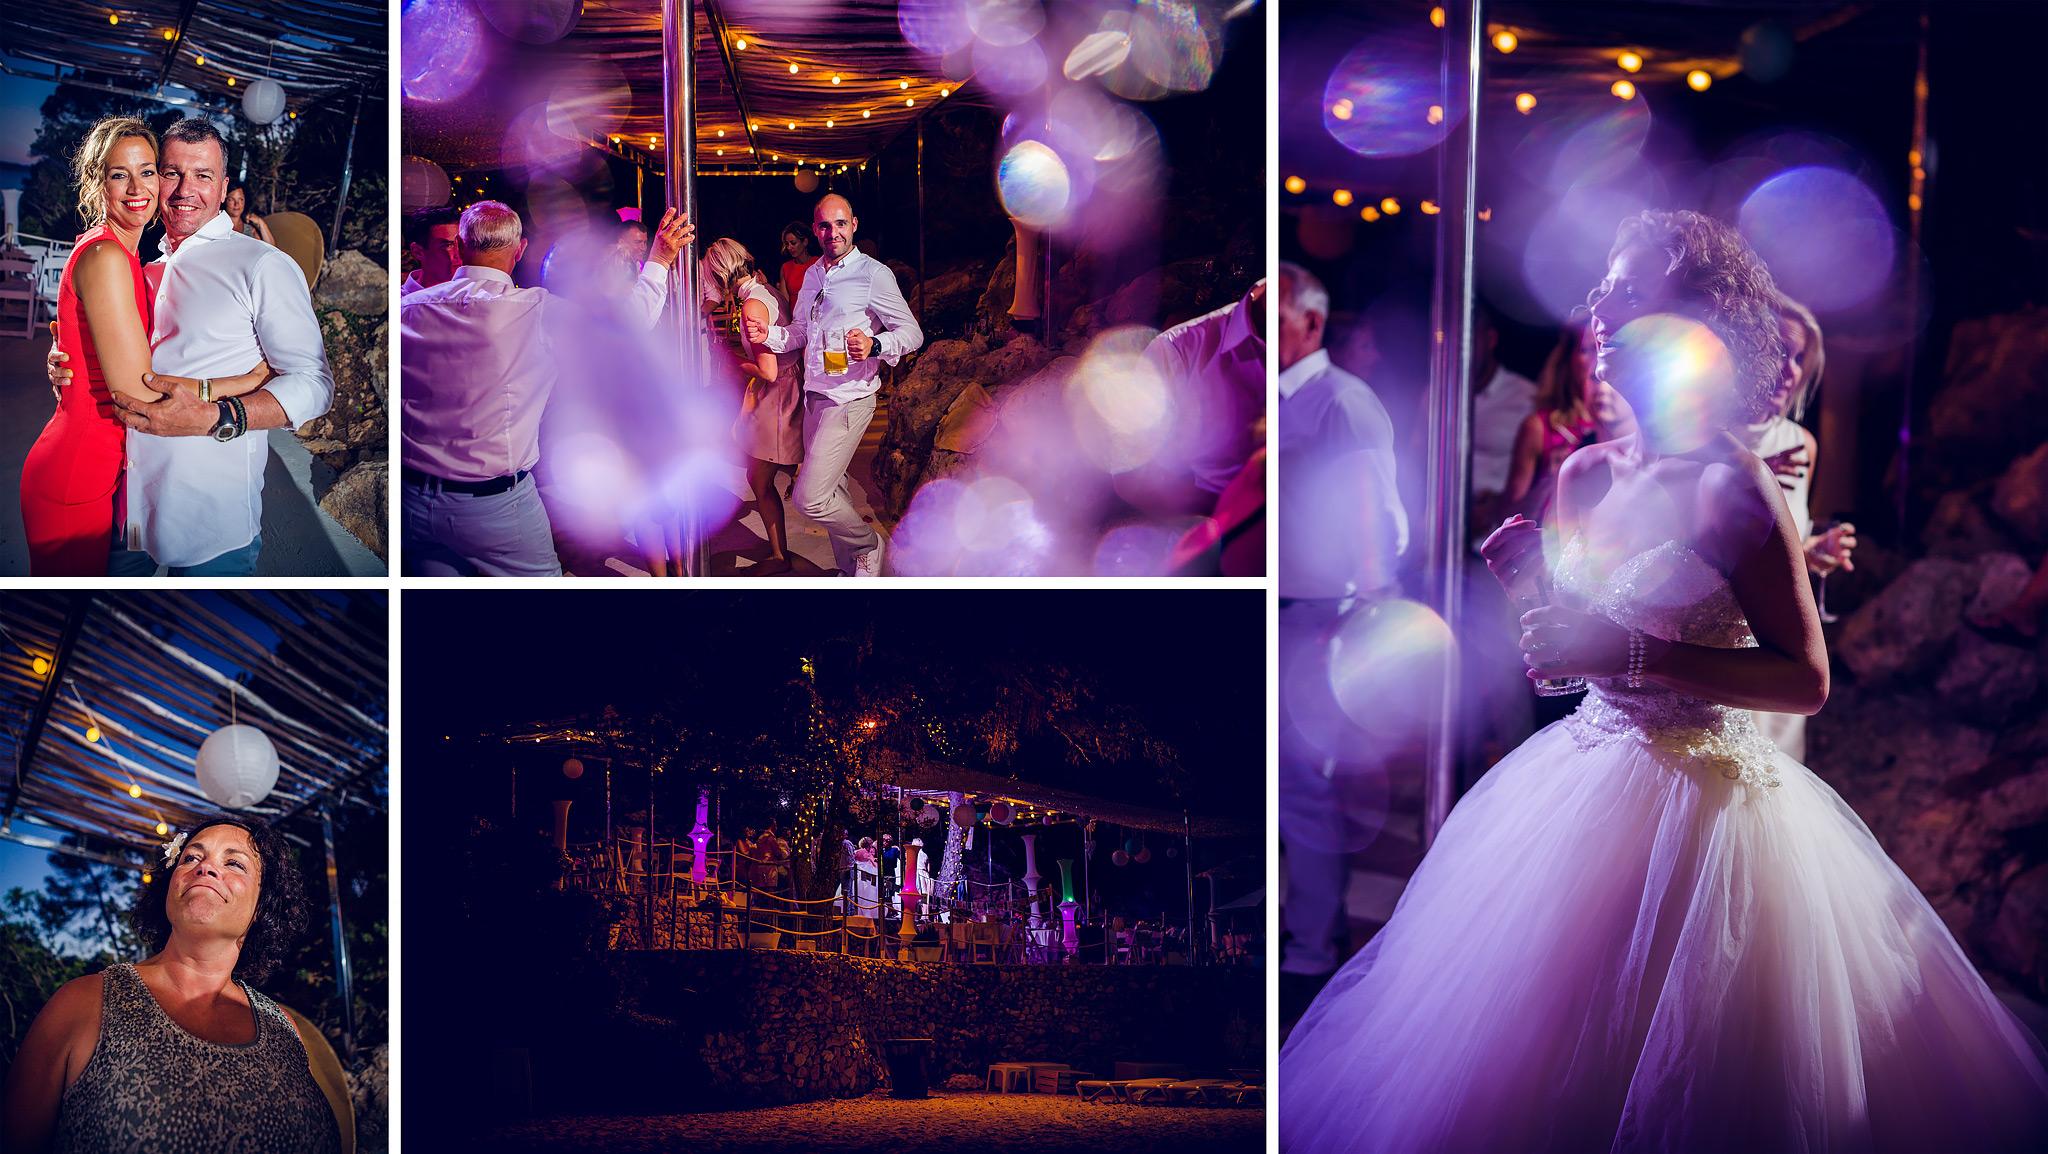 Bruidsreportage Destination Wedding Ibiza Mandy en Joost 024 - Bas Driessen Fotografie